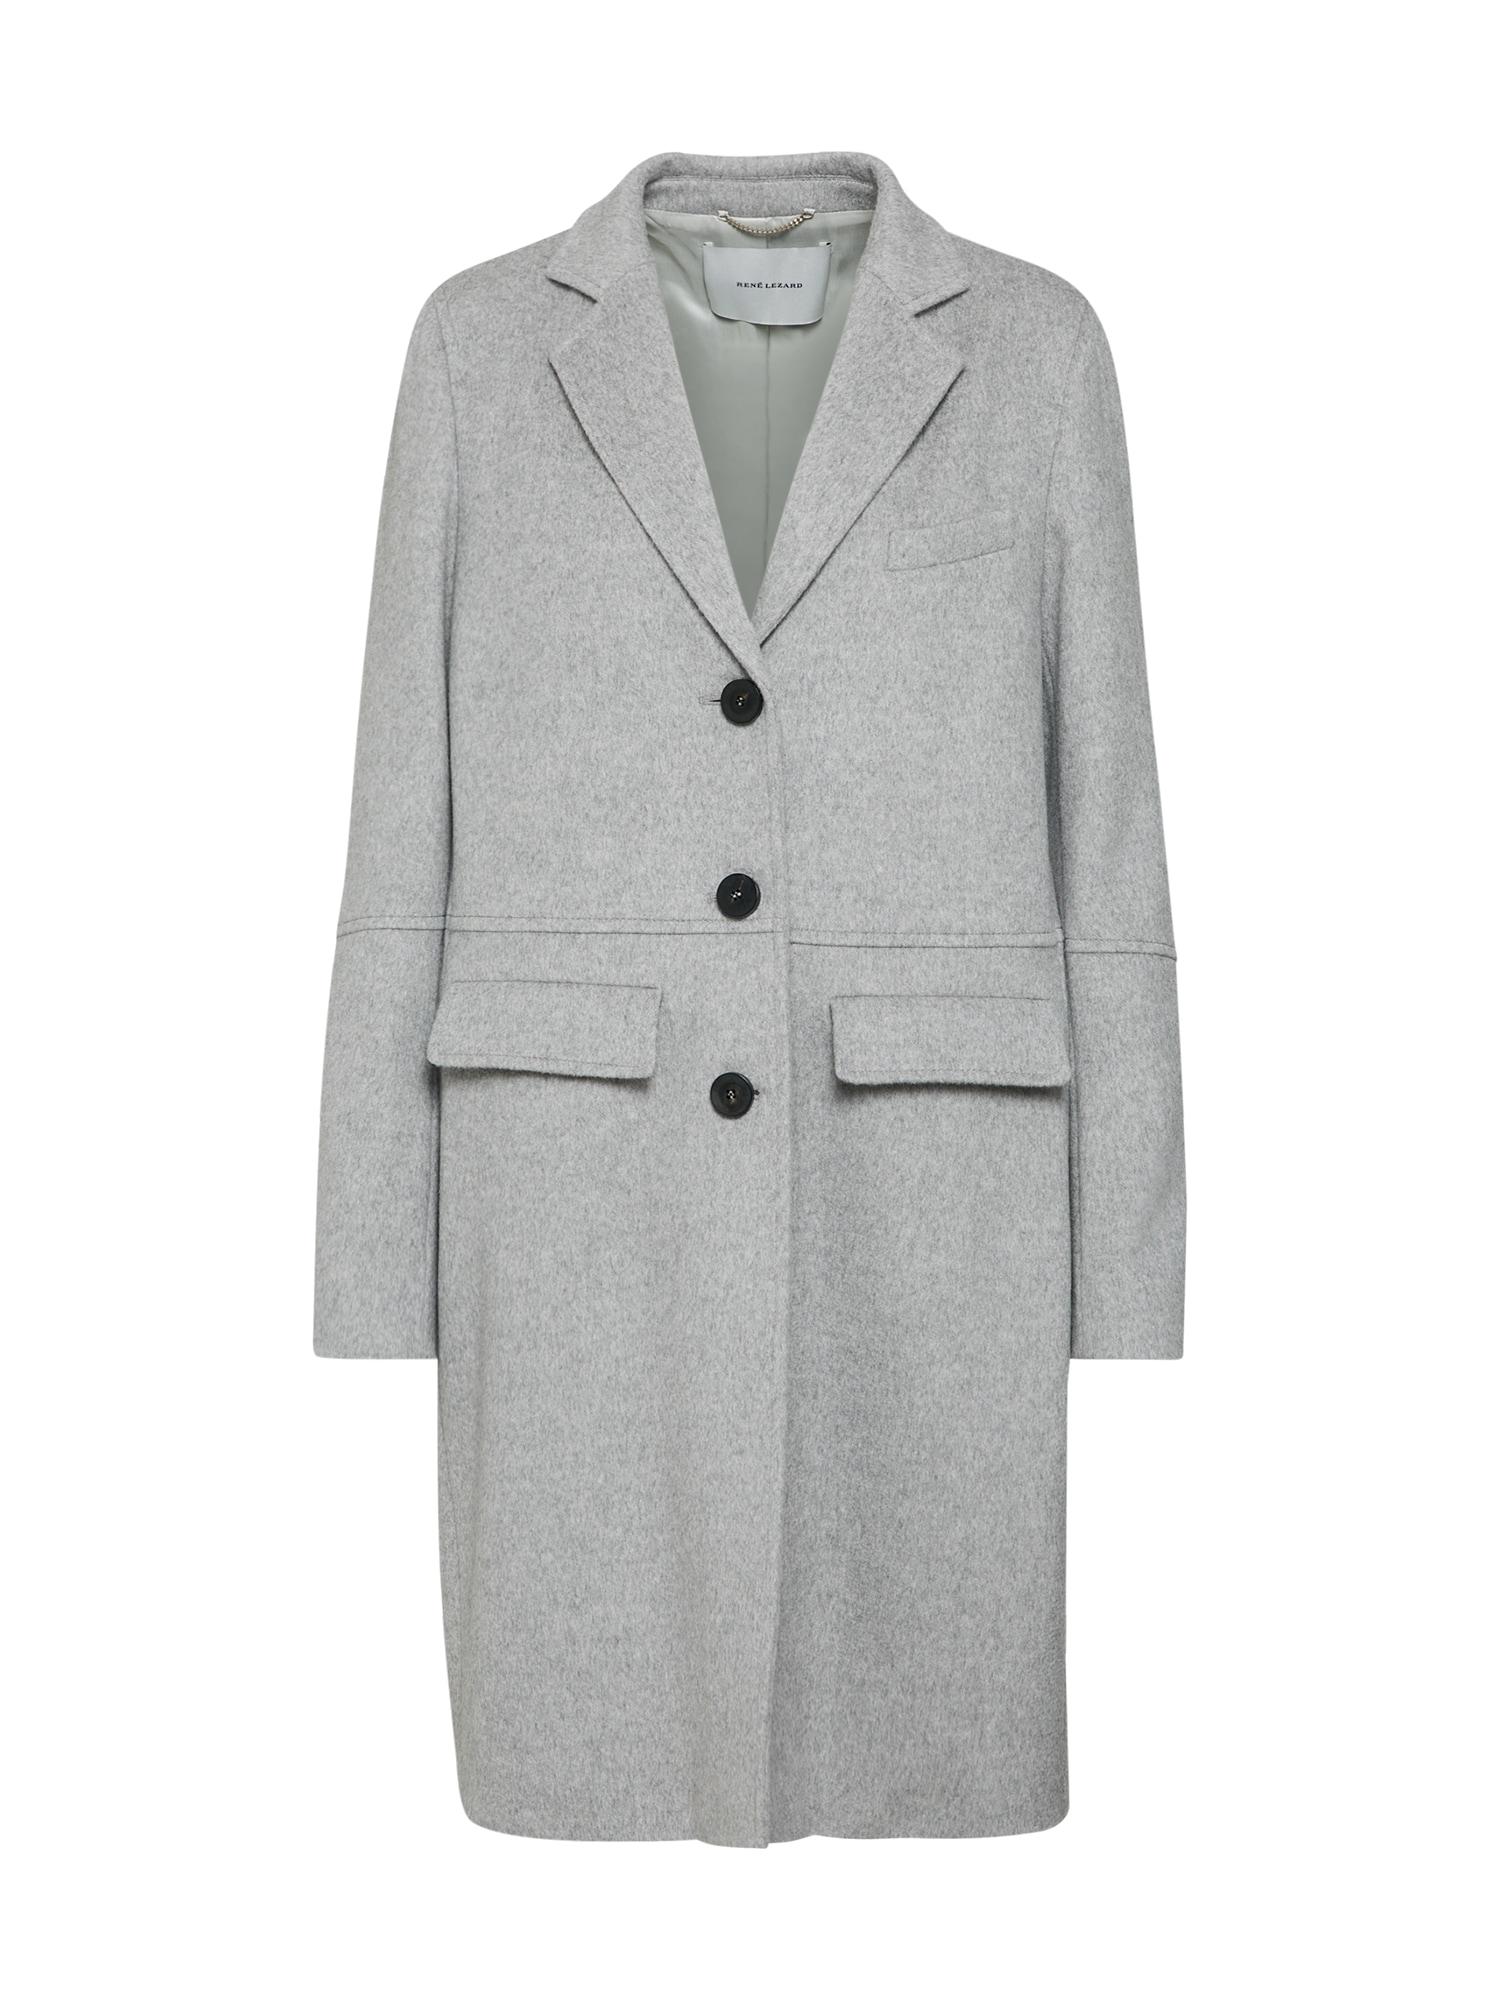 Přechodný kabát M020A šedá RENÉ LEZARD